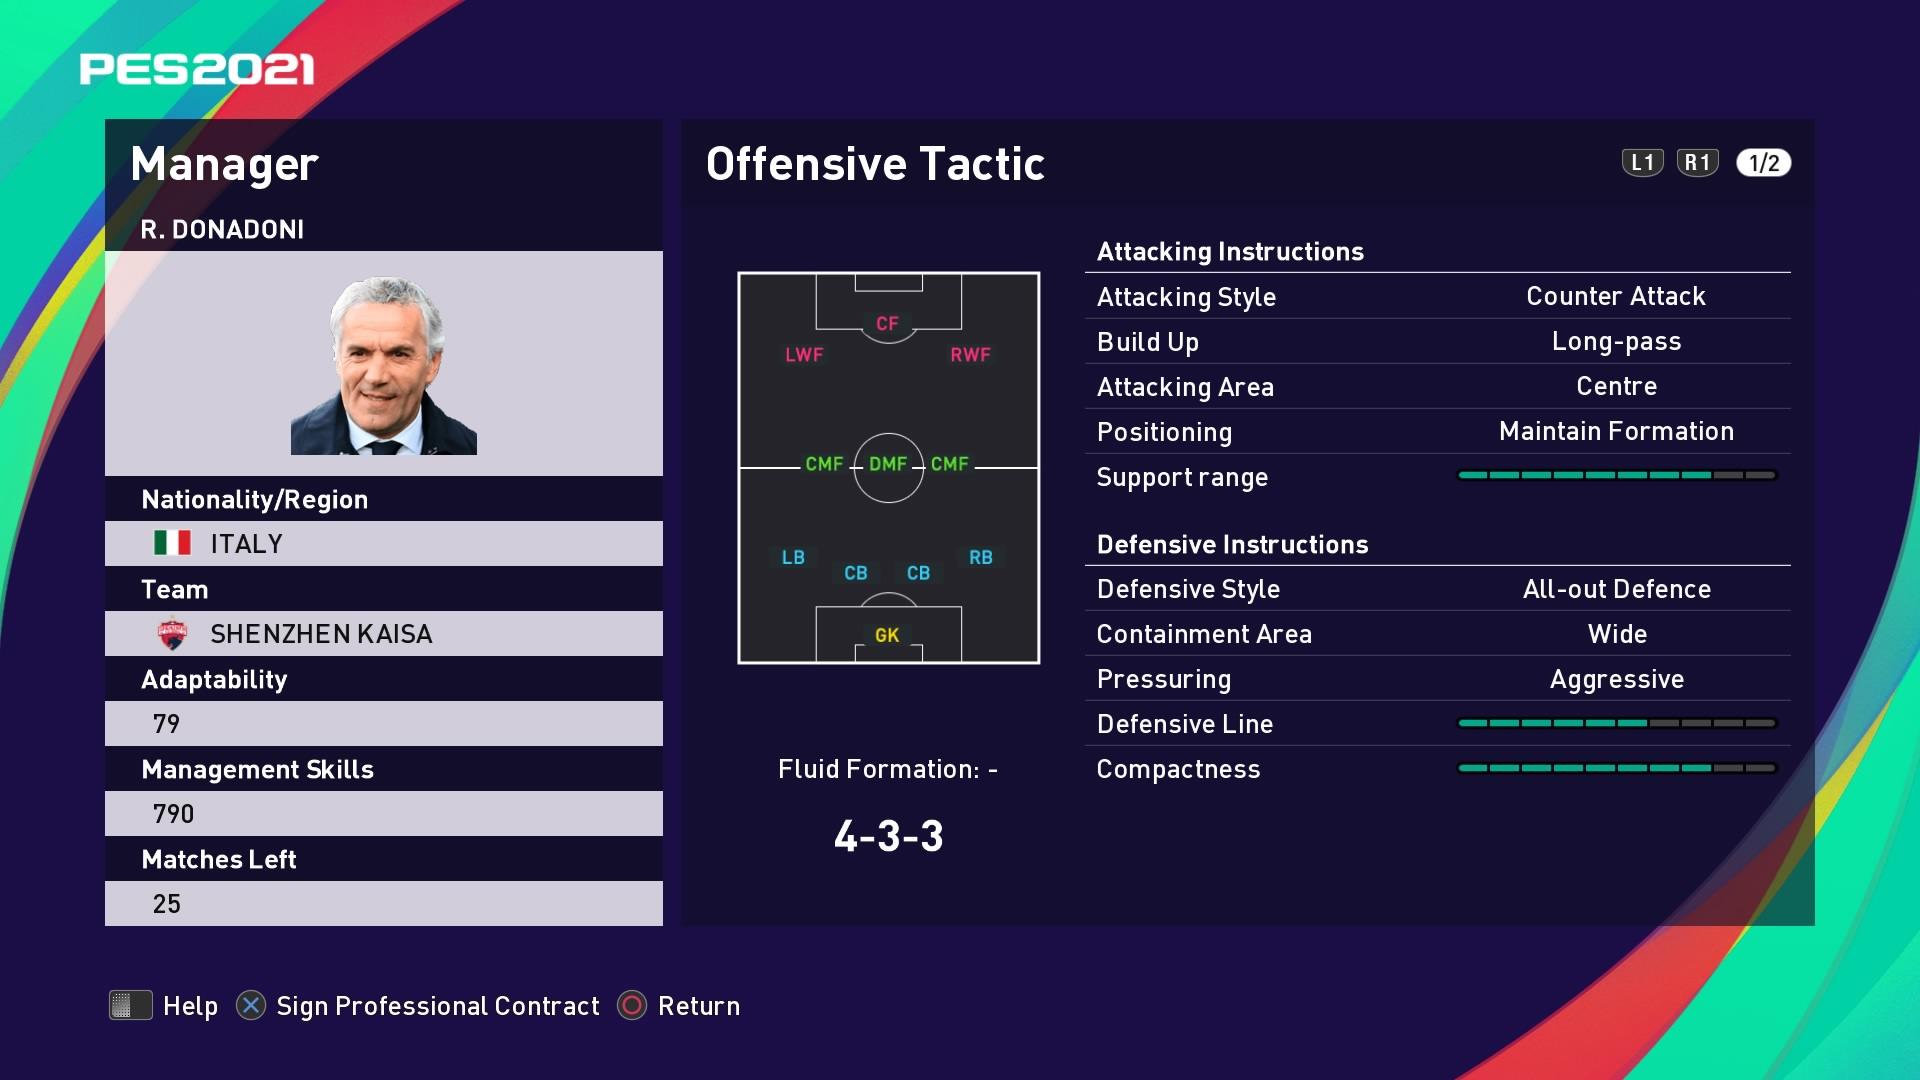 R. Donadoni (Roberto Donadoni) Offensive Tactic in PES 2021 myClub